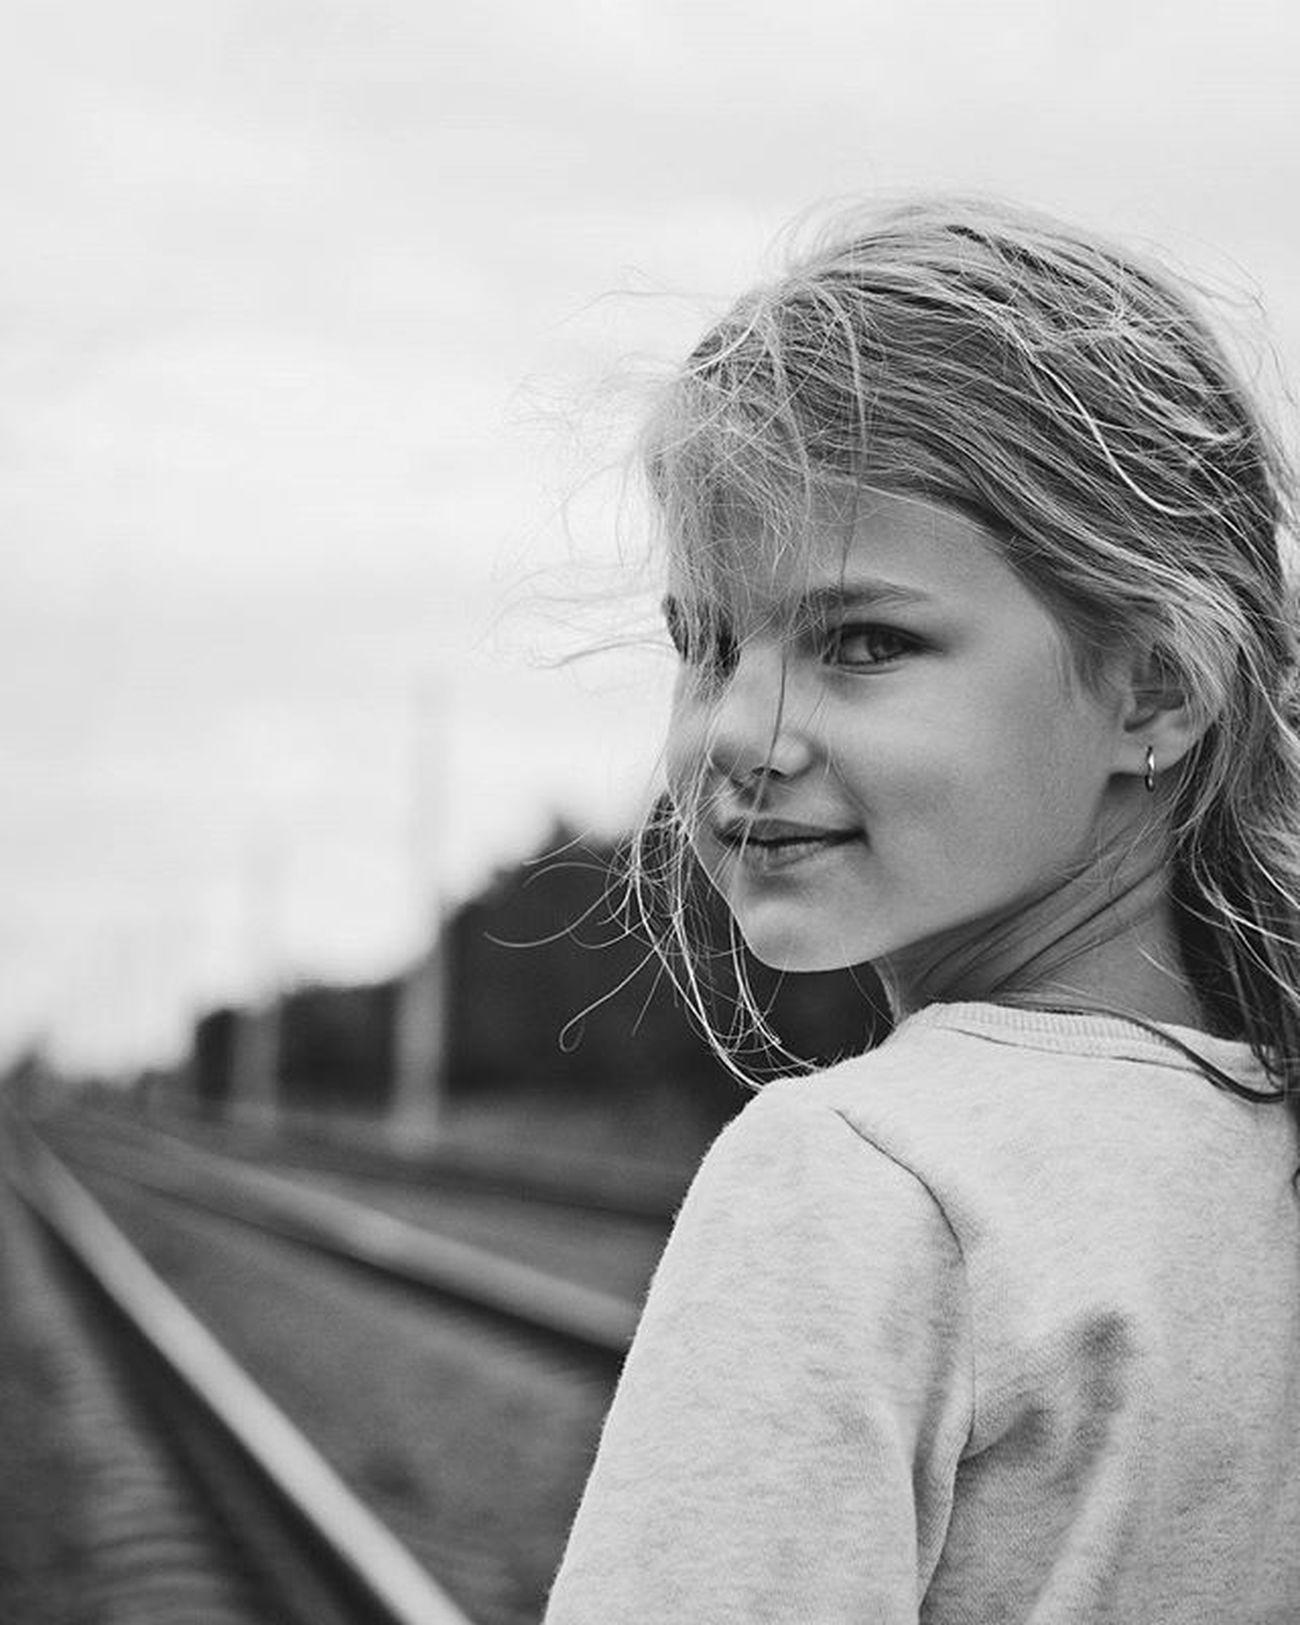 Daughter Girl Children Child Blackandwhite Monochrome Hair View Look Rails Beauty Portrait